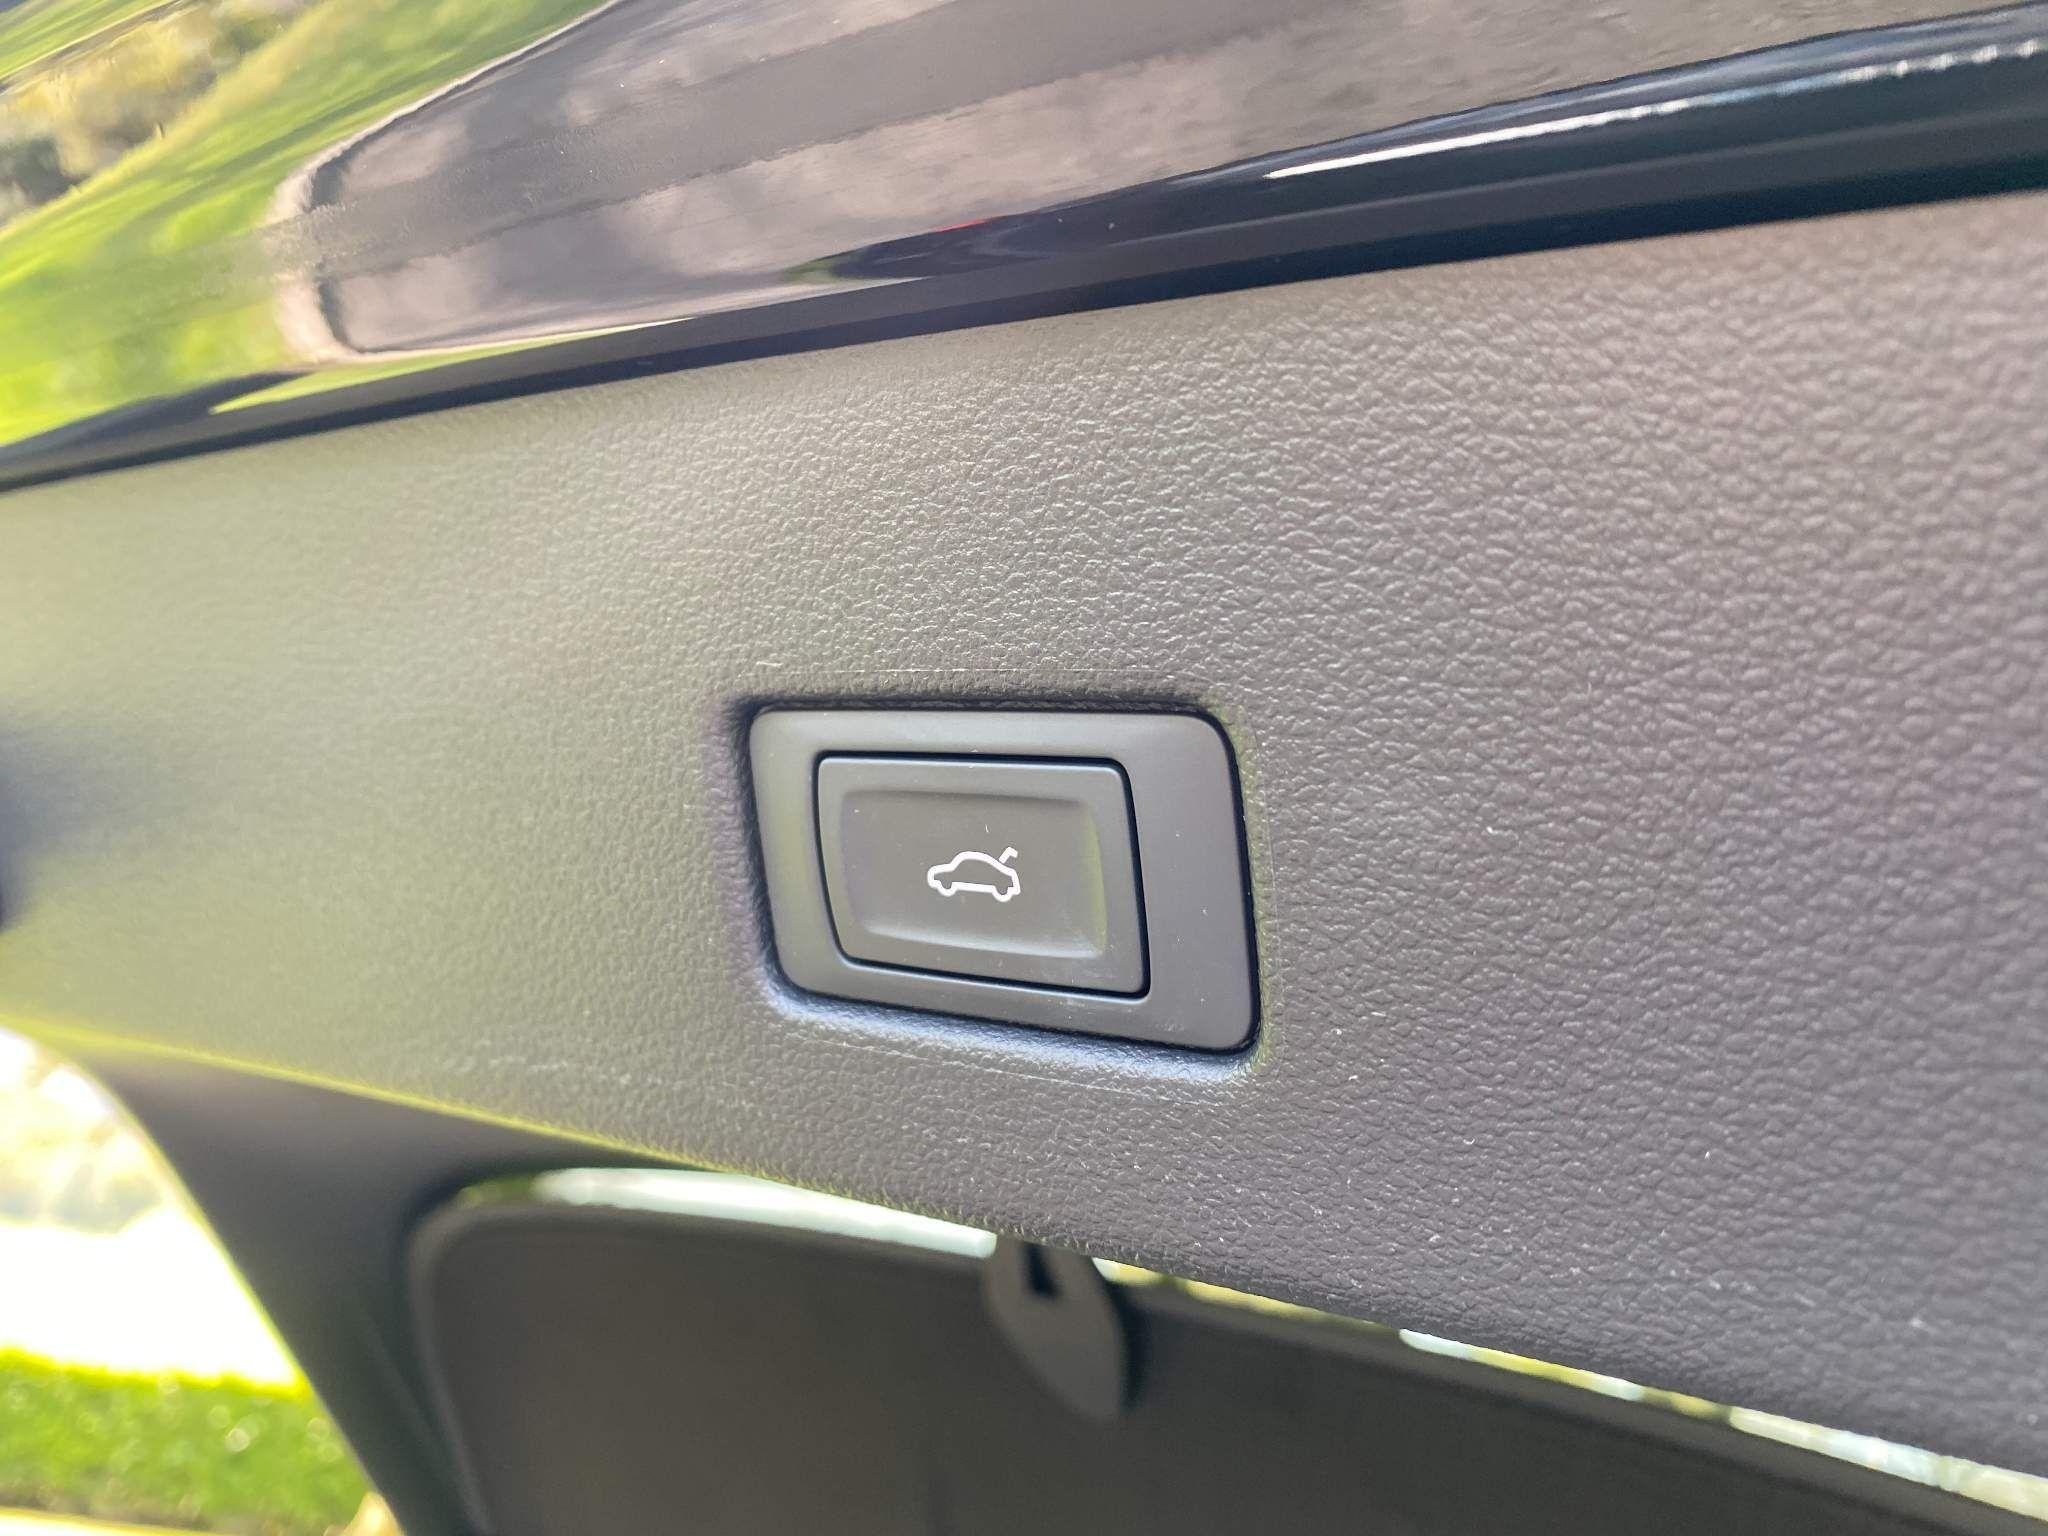 2019 Audi A7 3.0 TDI V6 50 S line Sportback Tiptronic quattro (s/s) 5dr Diesel Automatic – Moyway Motors Dungannon full